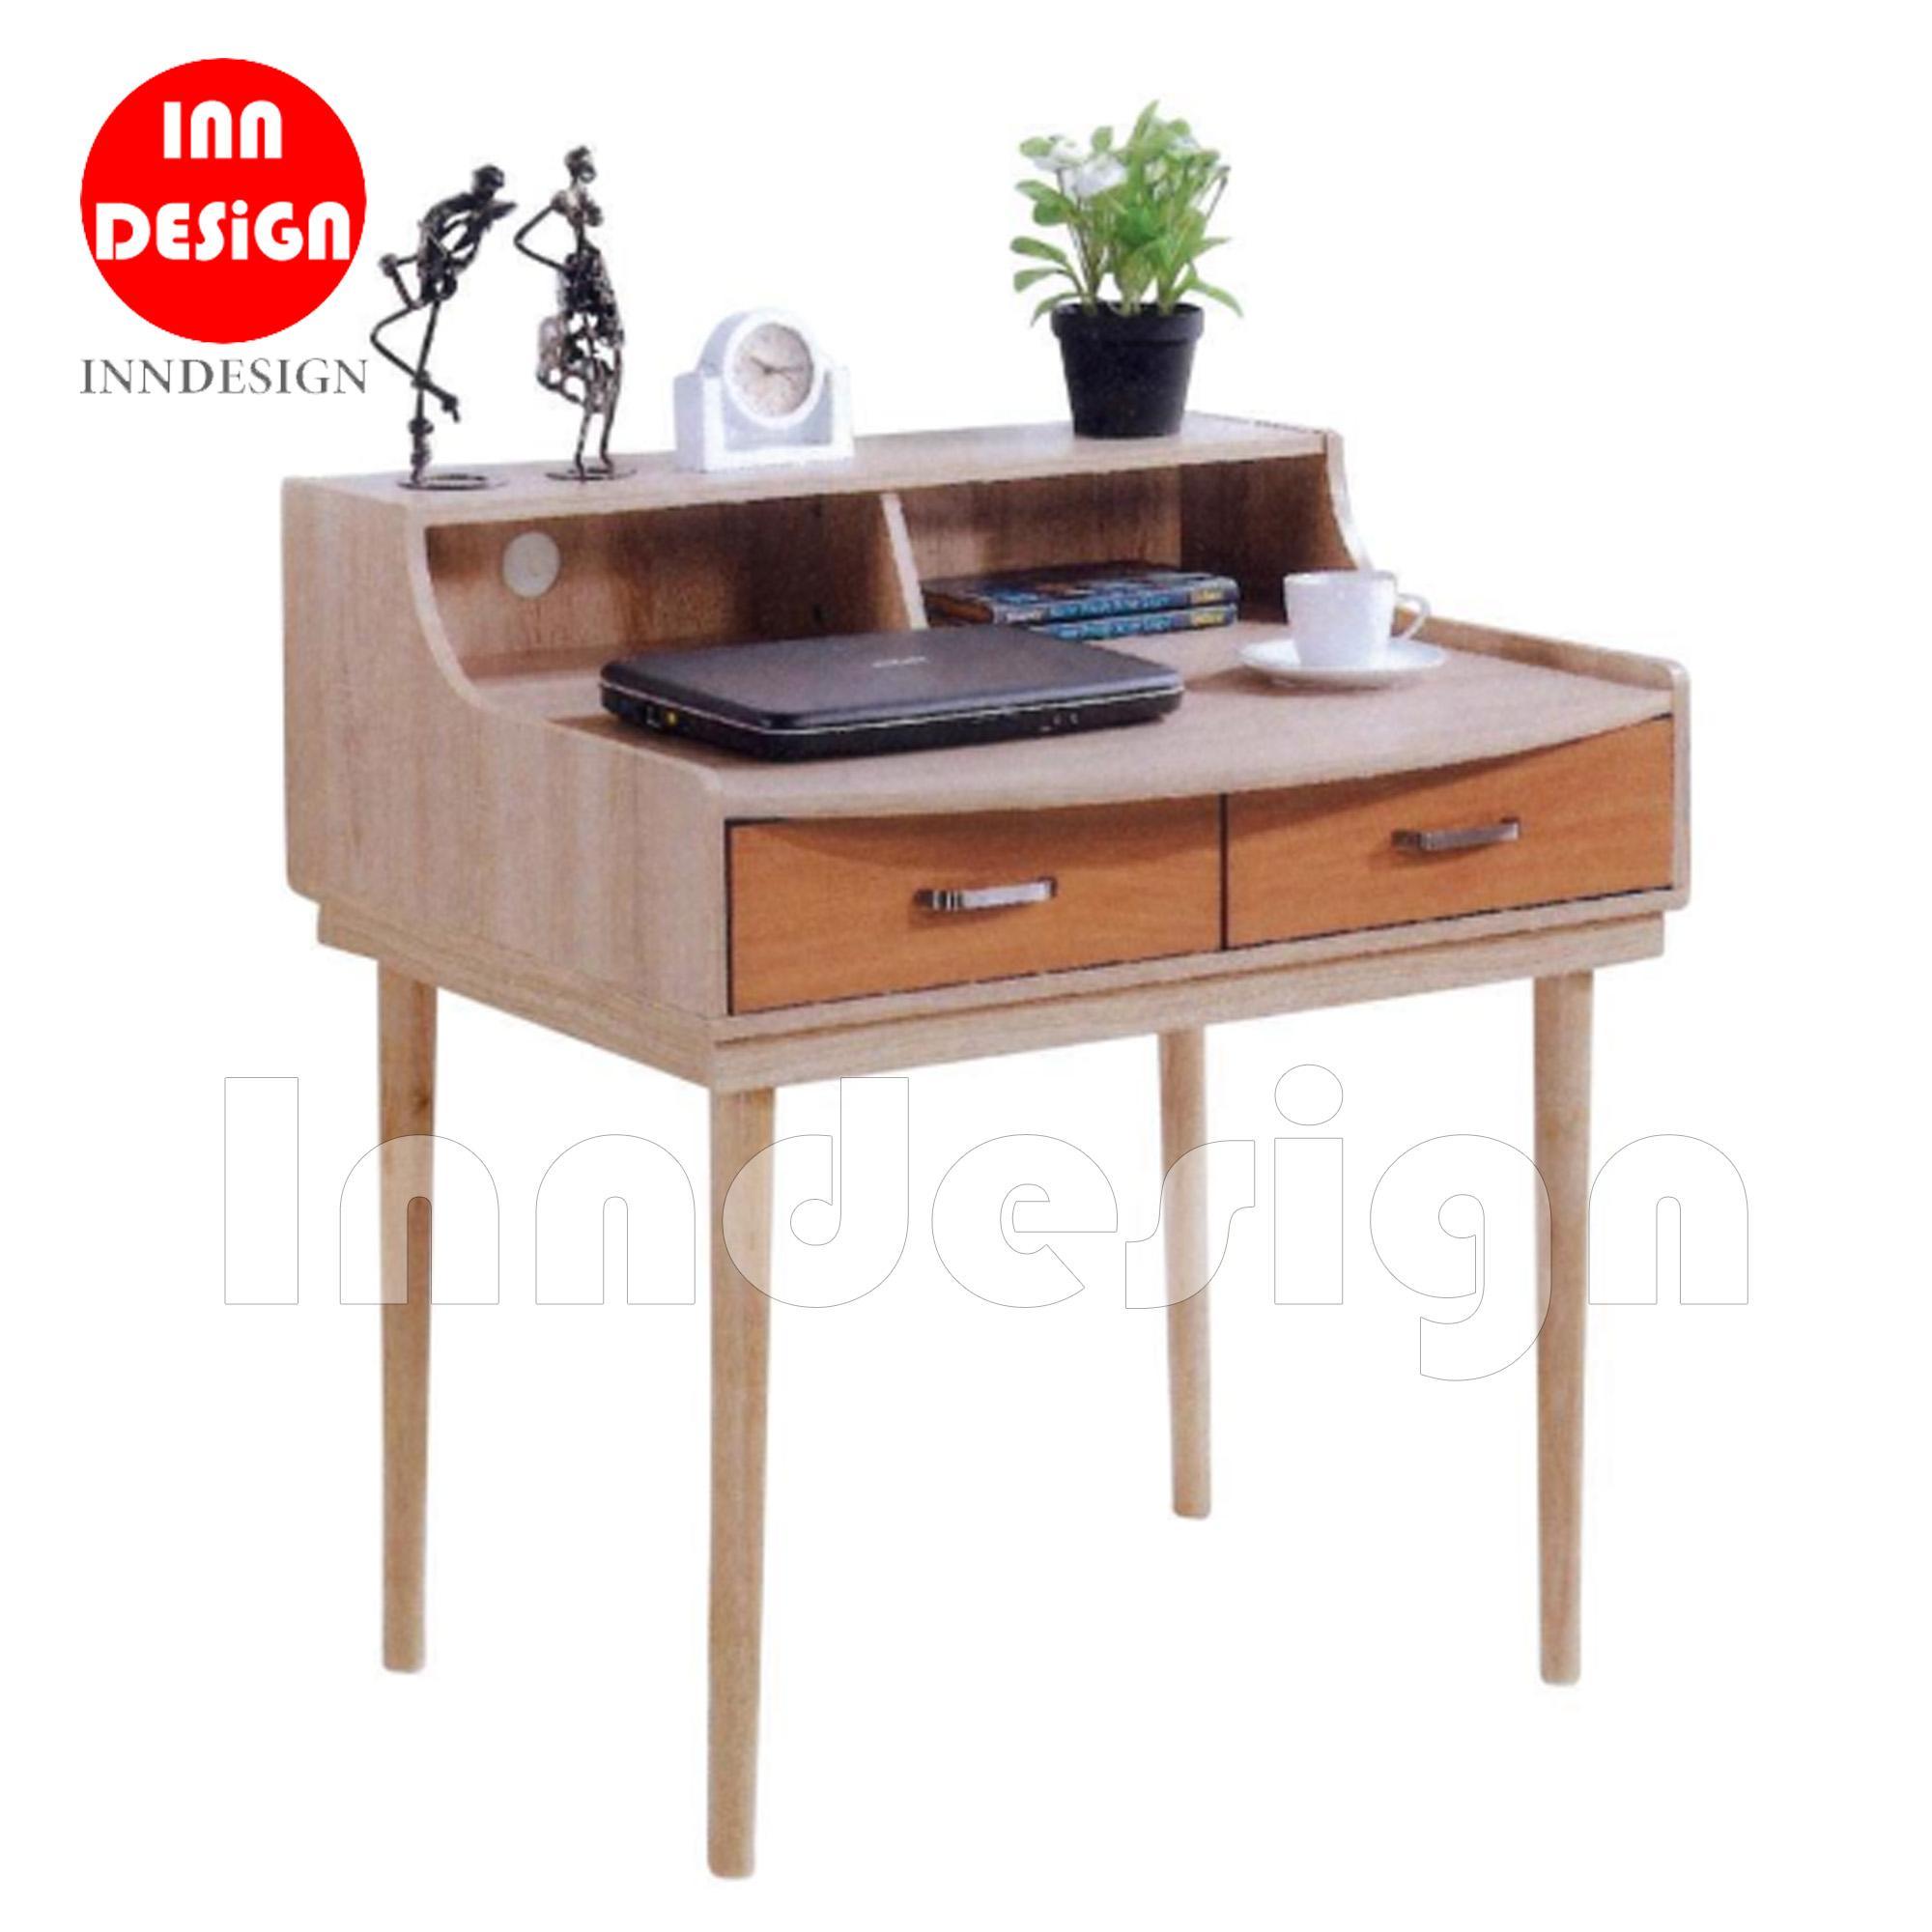 Niri Study Table With Drawer